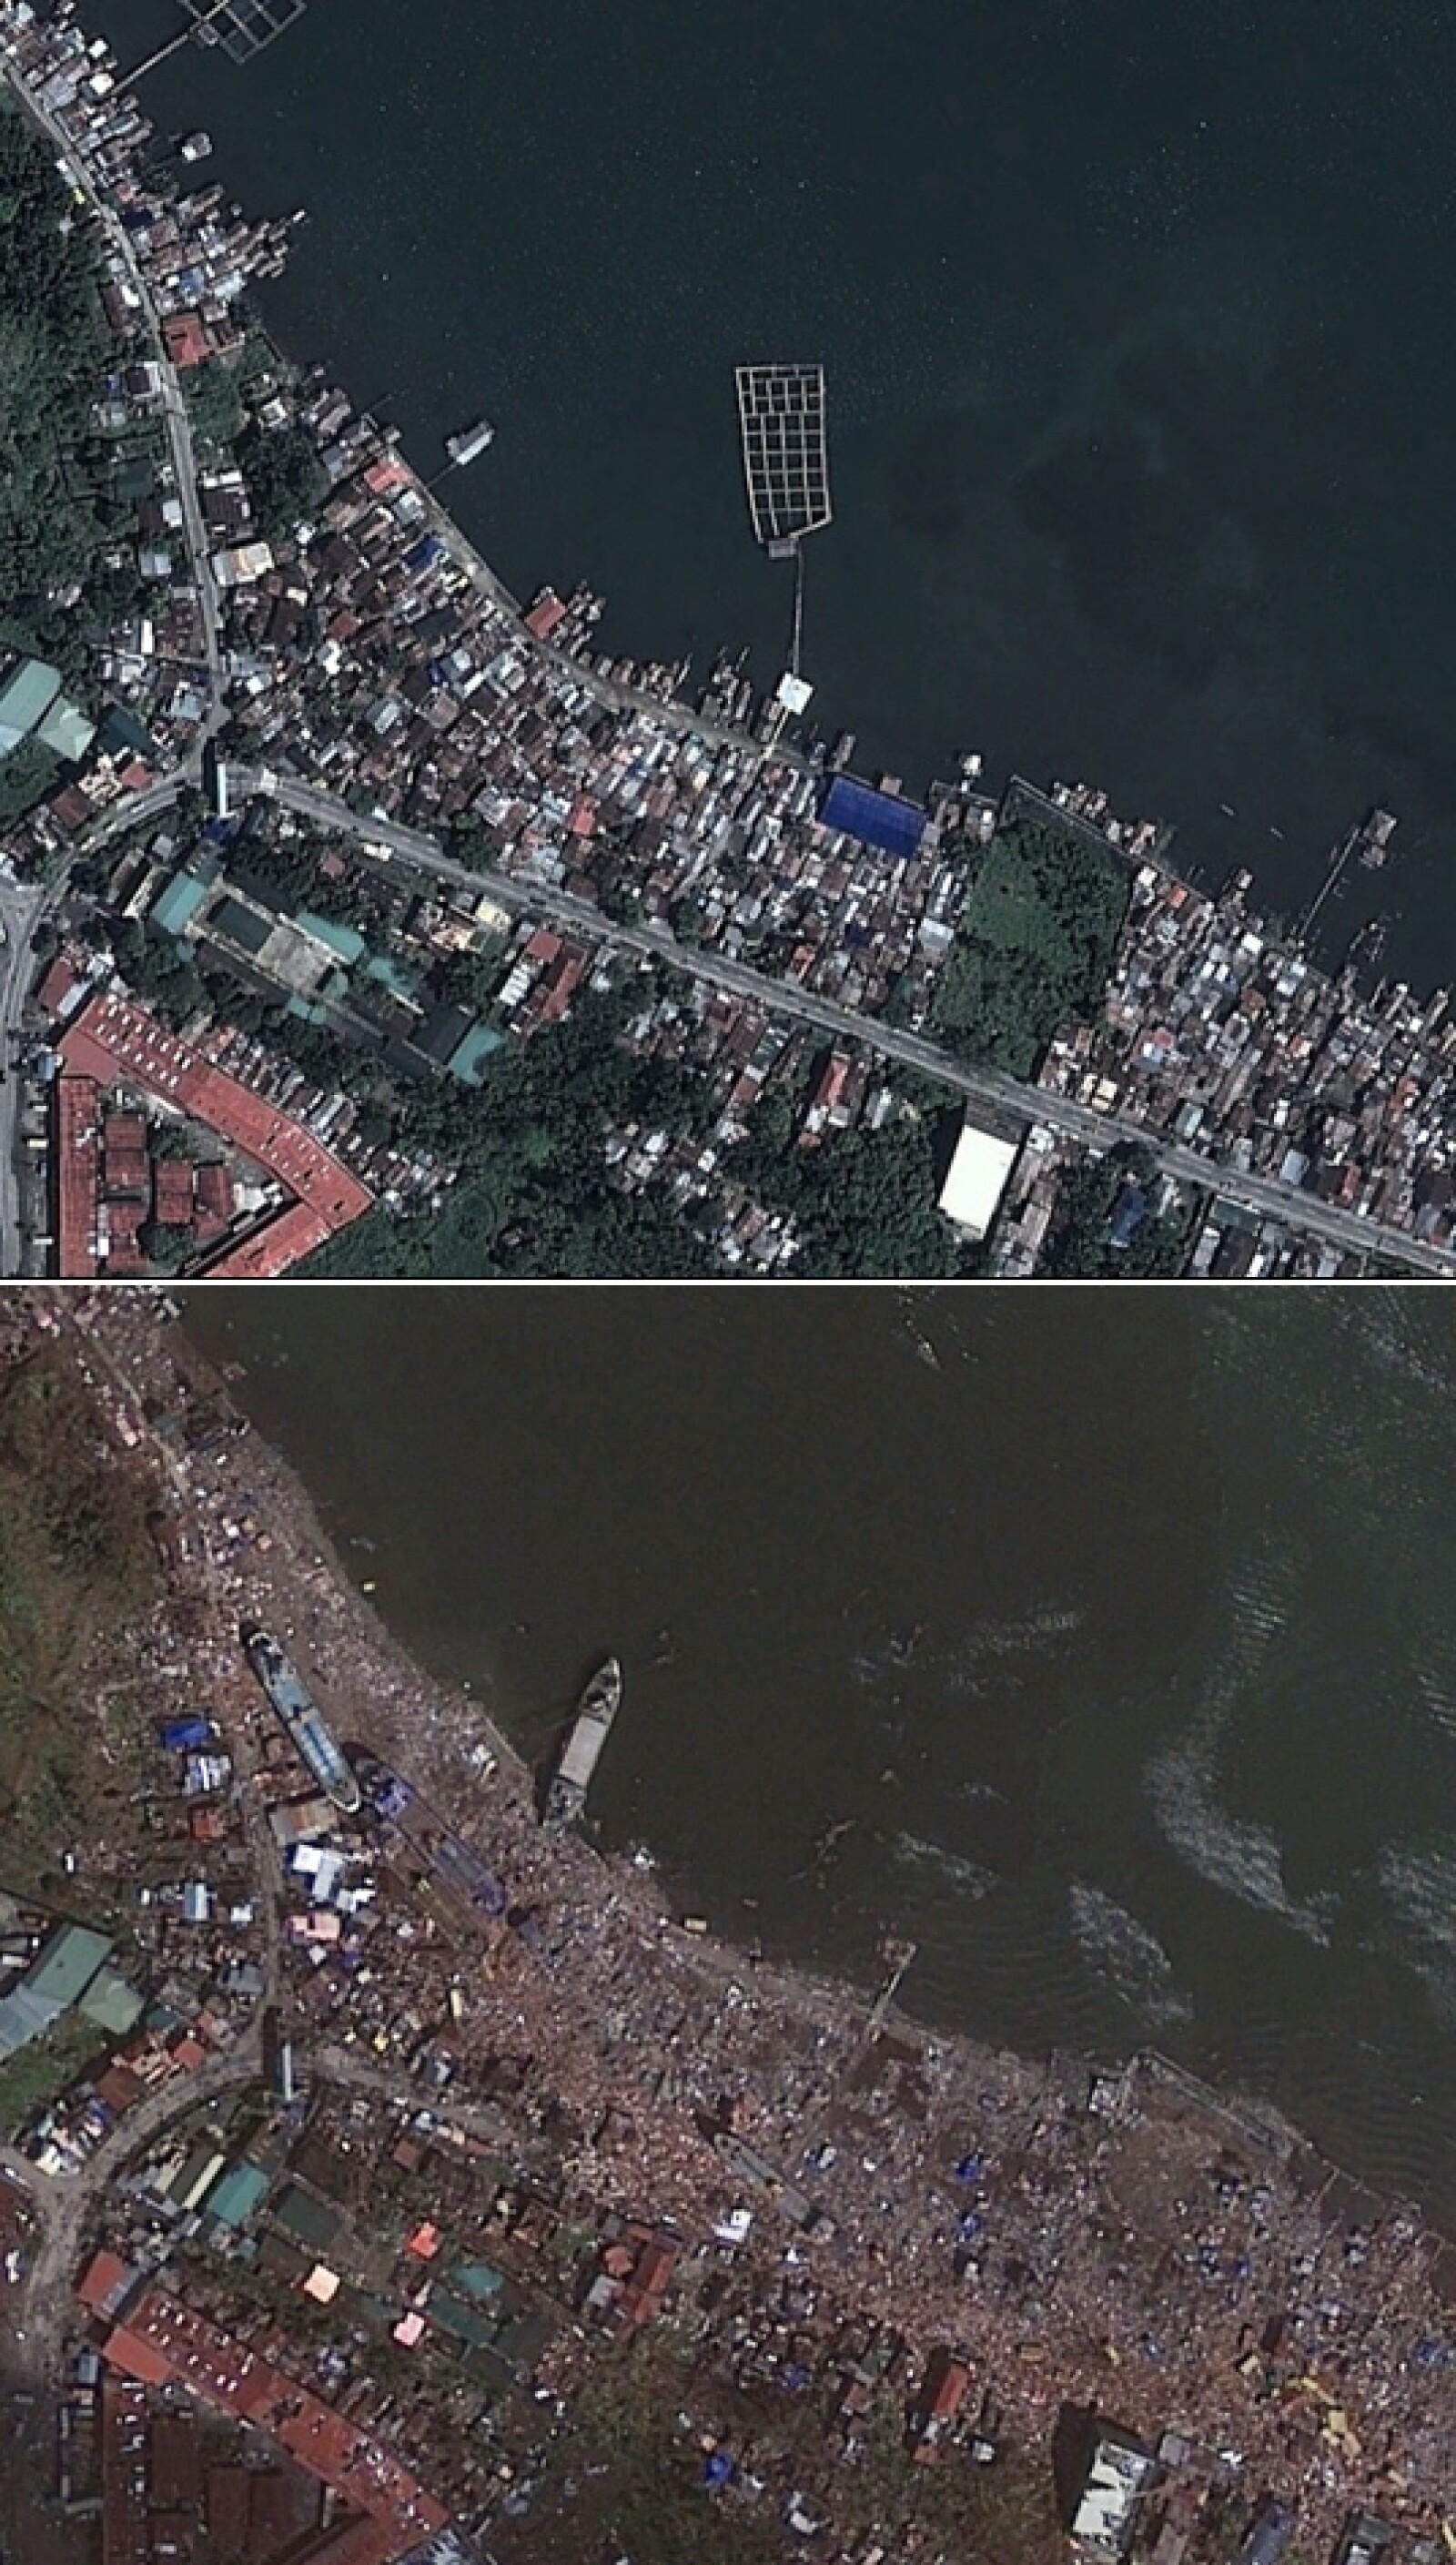 tacloban satelite 3